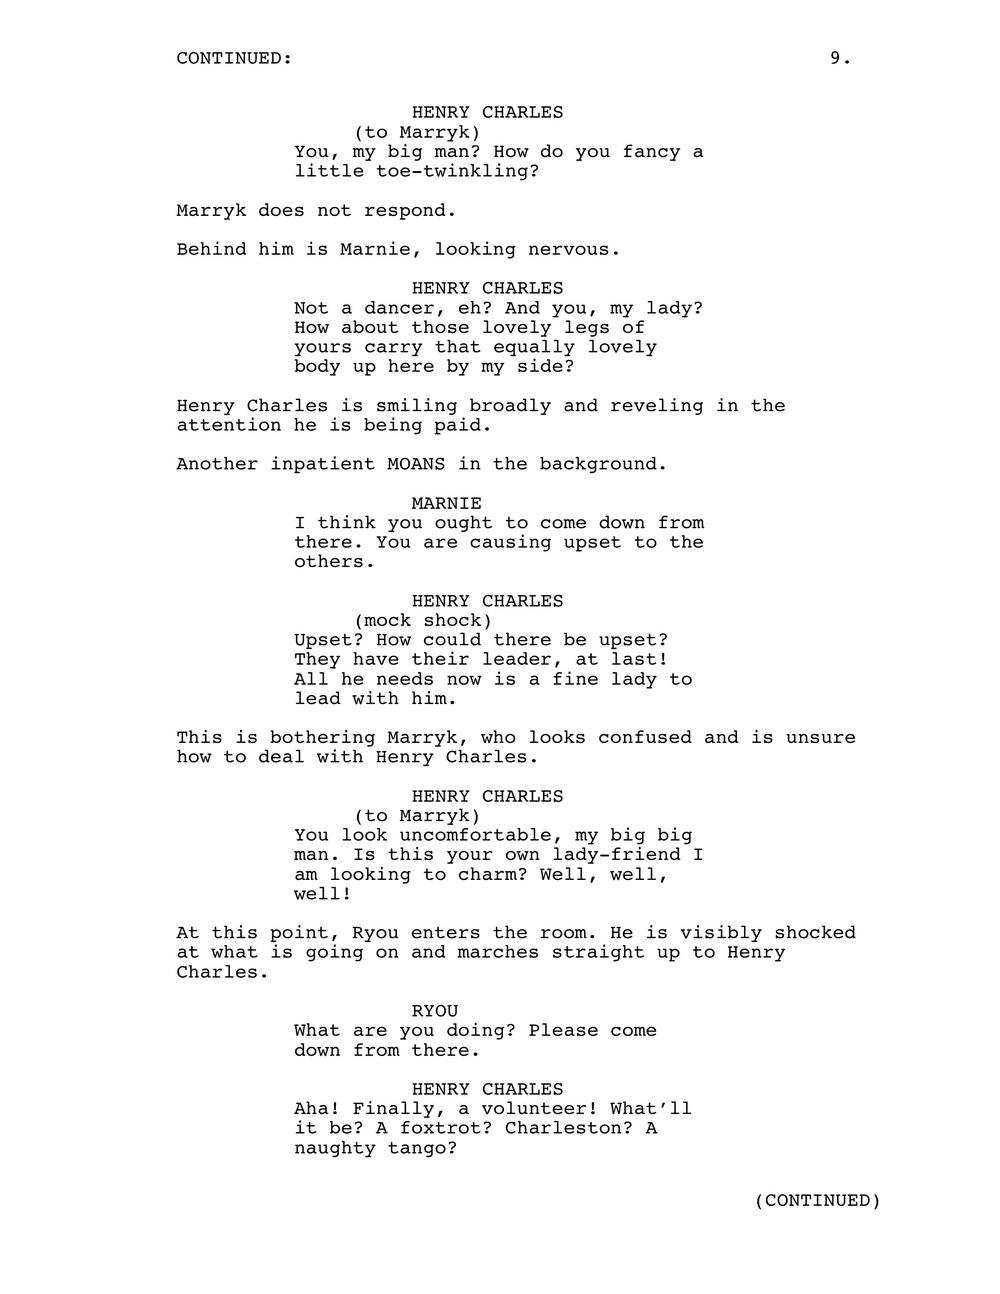 'Introducing Henry Charles' (Pilot) by Alexander Craig | 9.jpeg